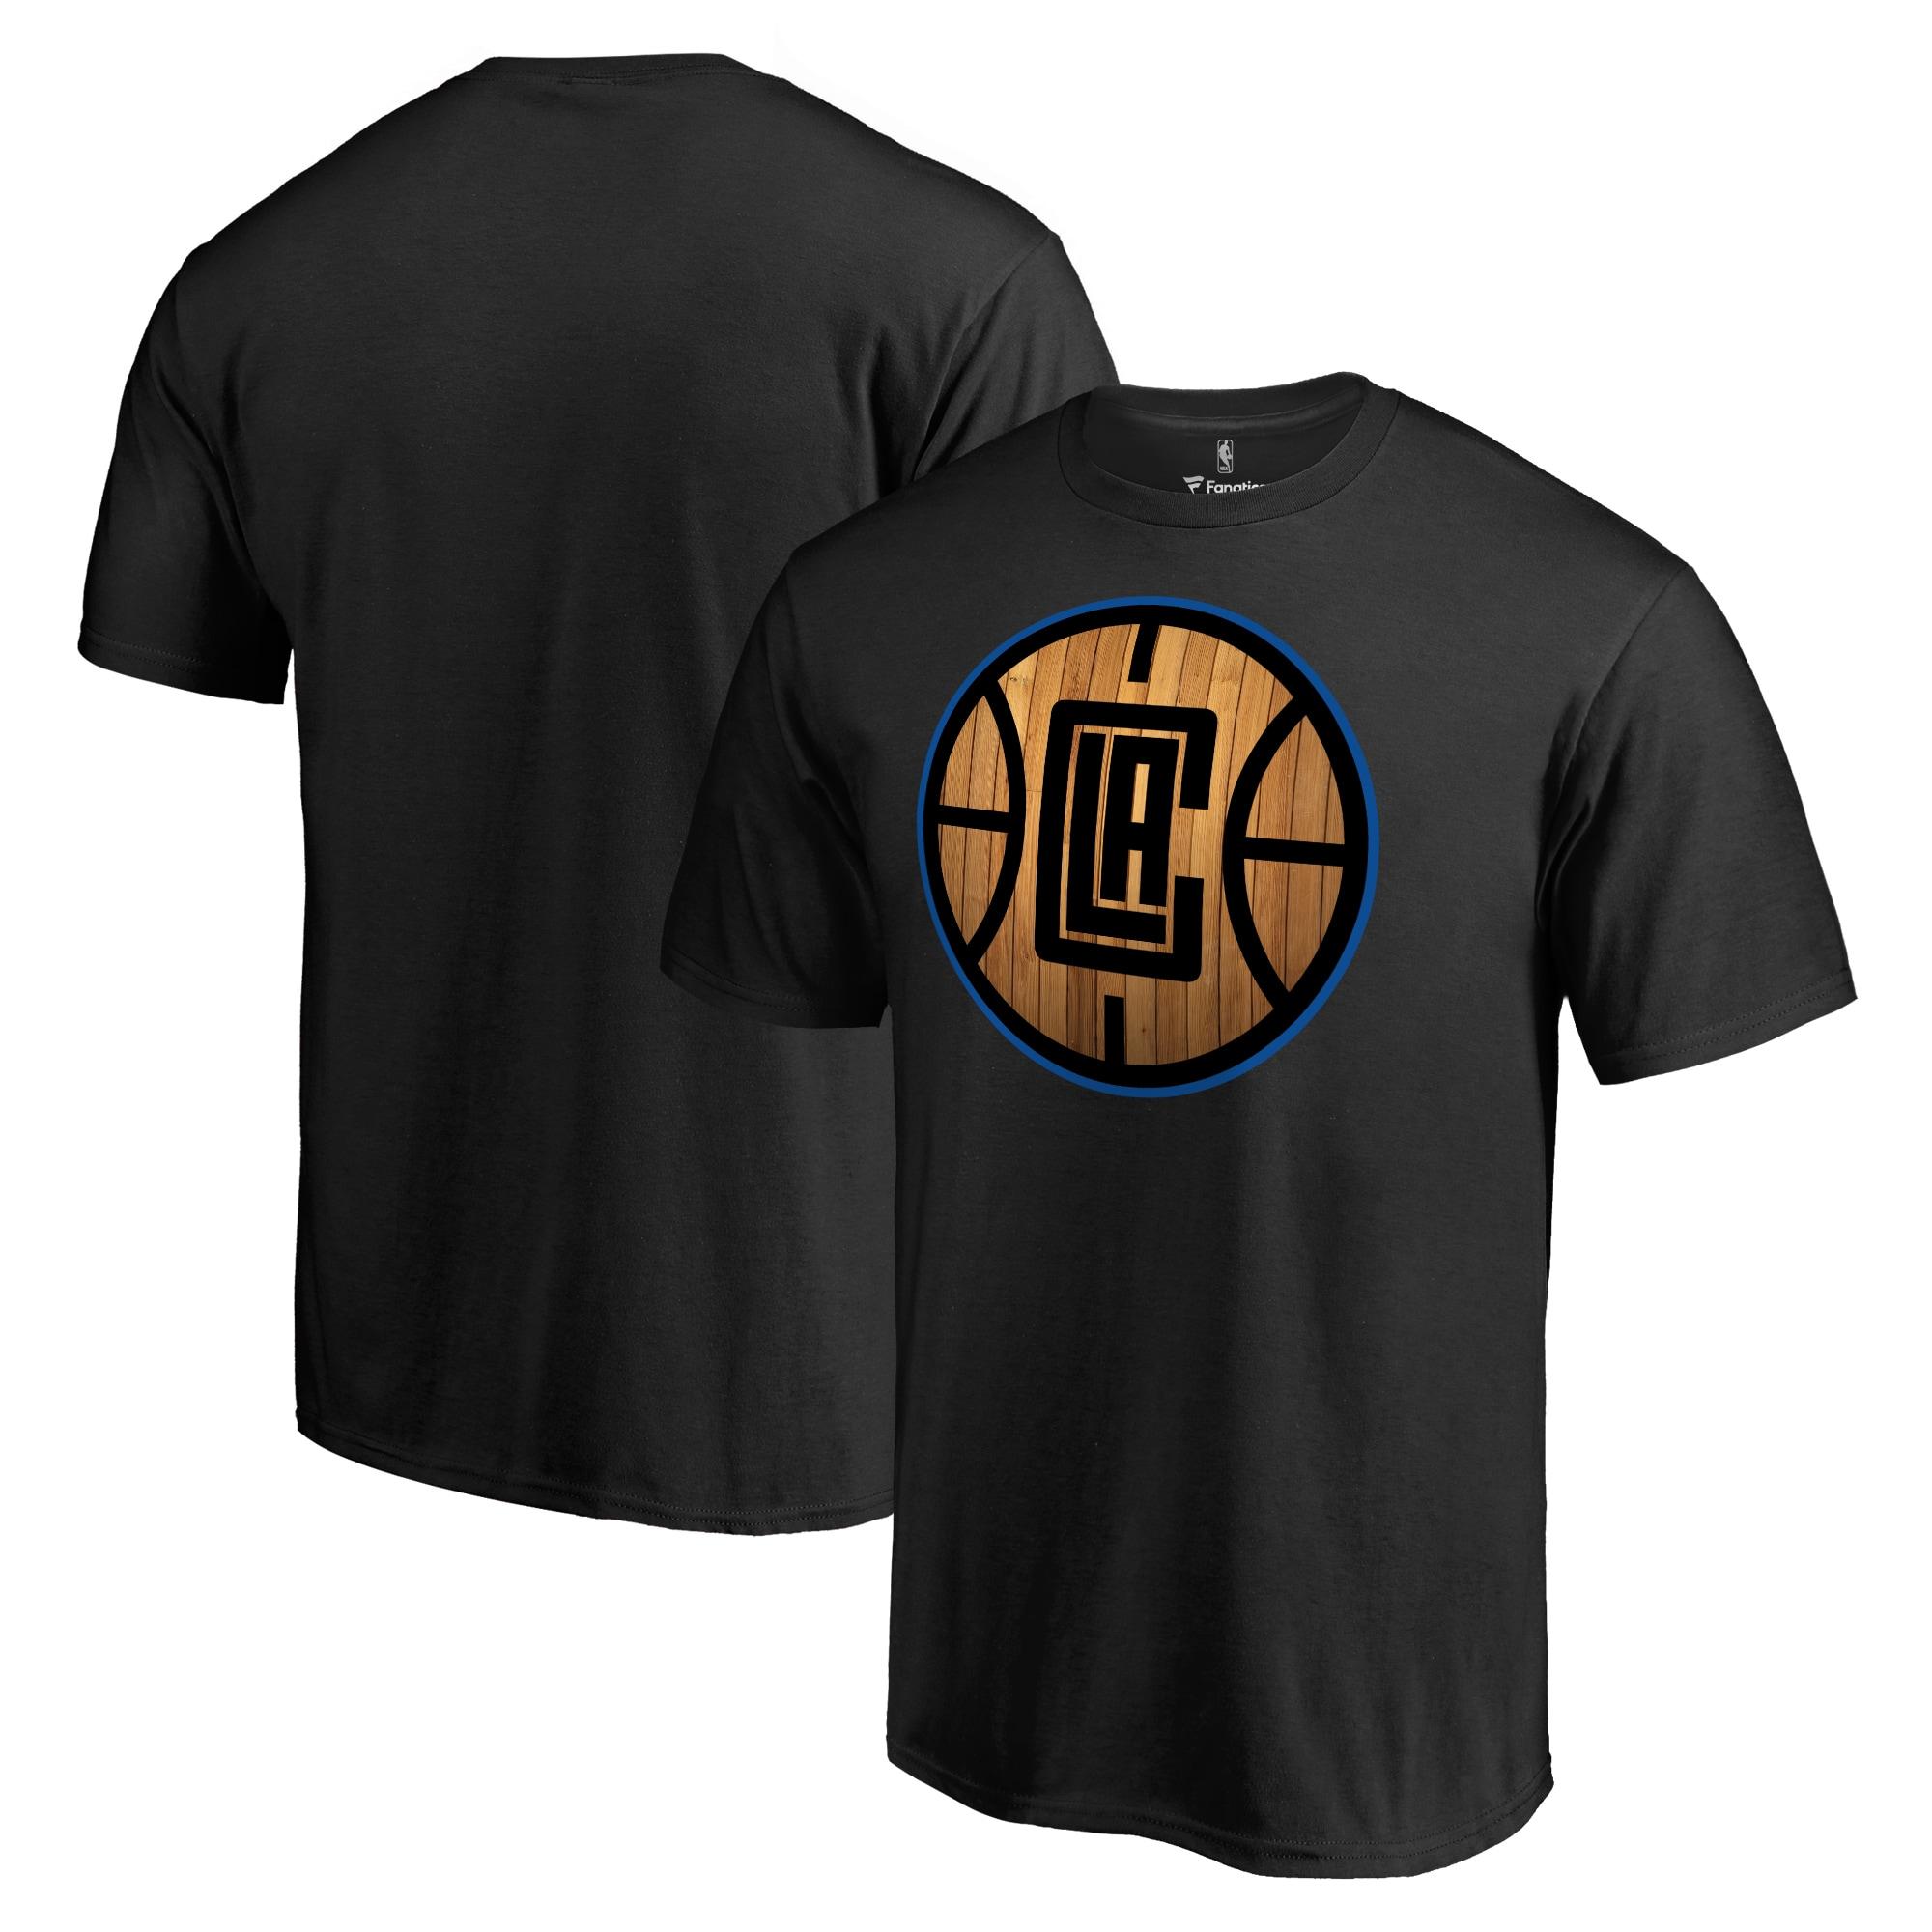 LA Clippers Hardwood T-Shirt - Black